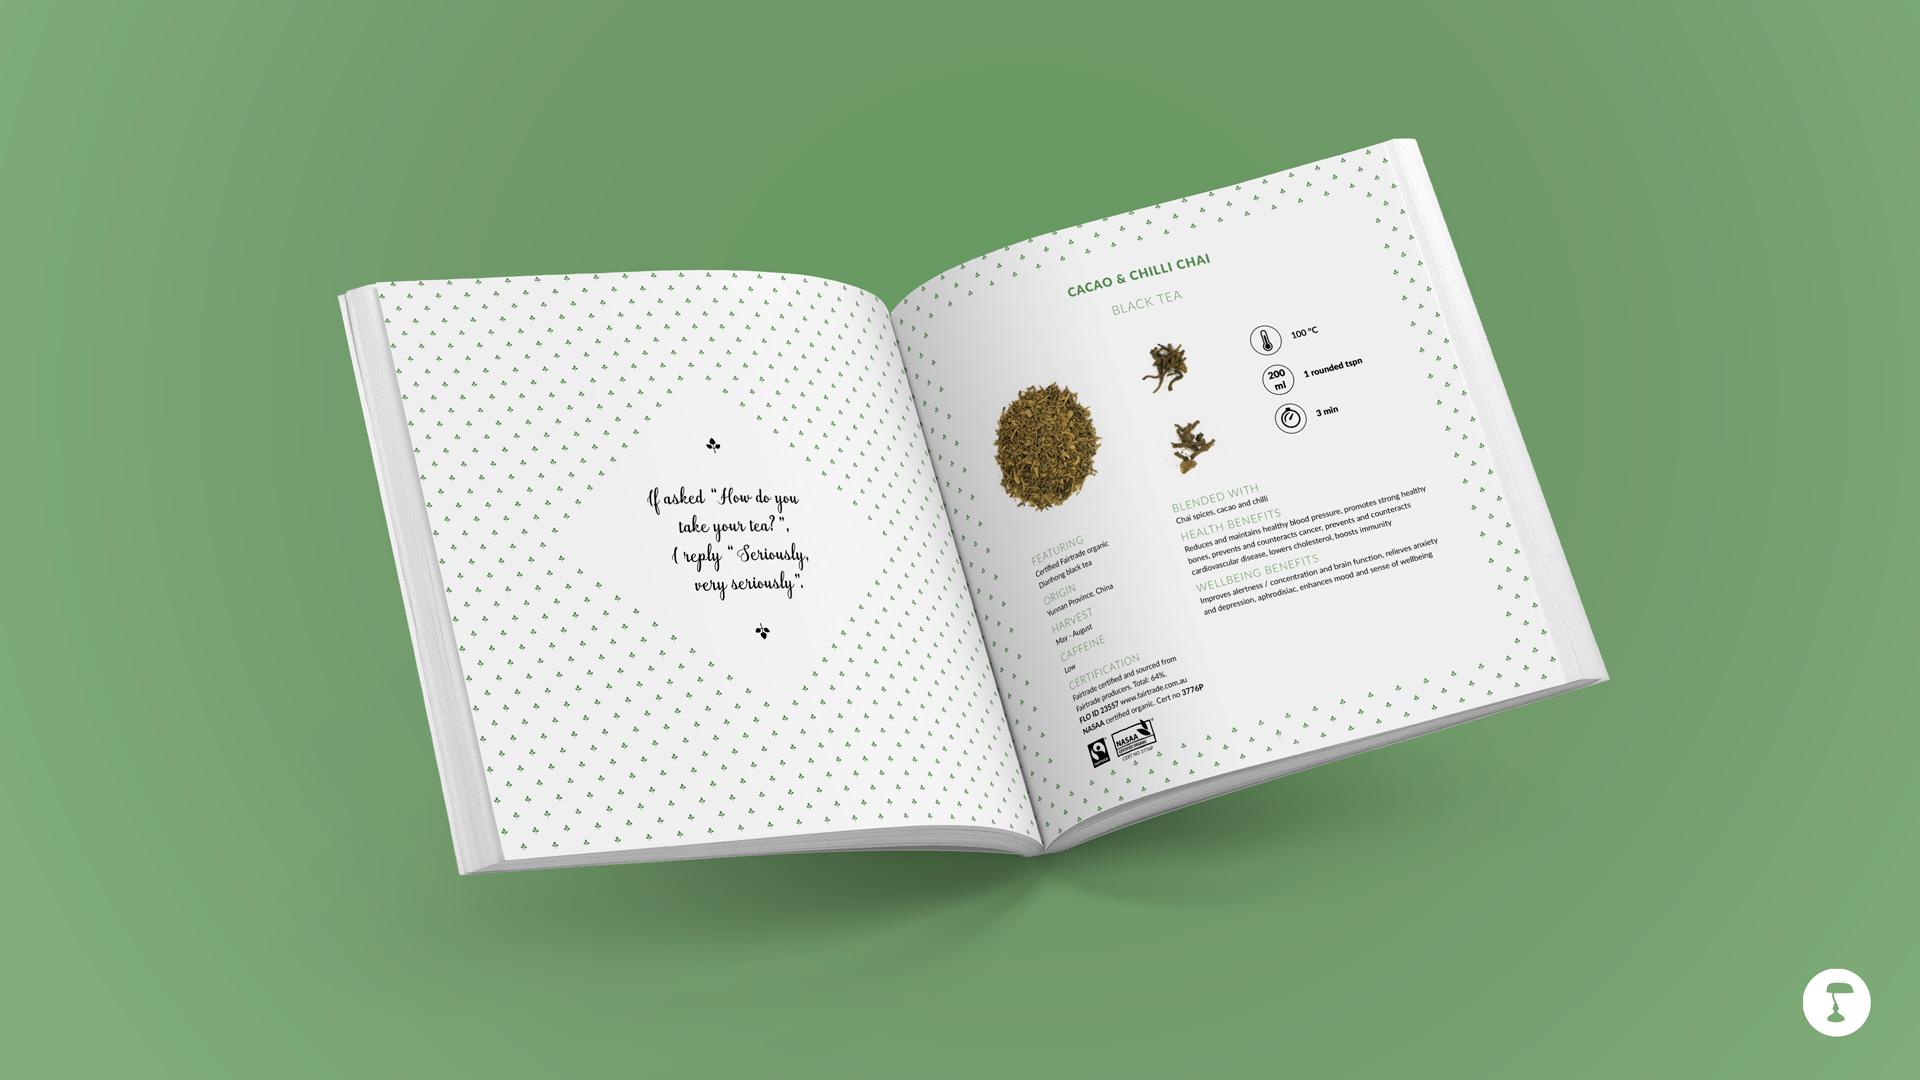 tielka_-_tea_catalogue_-_2017-2018_-_mockup_-_p8-9.jpg